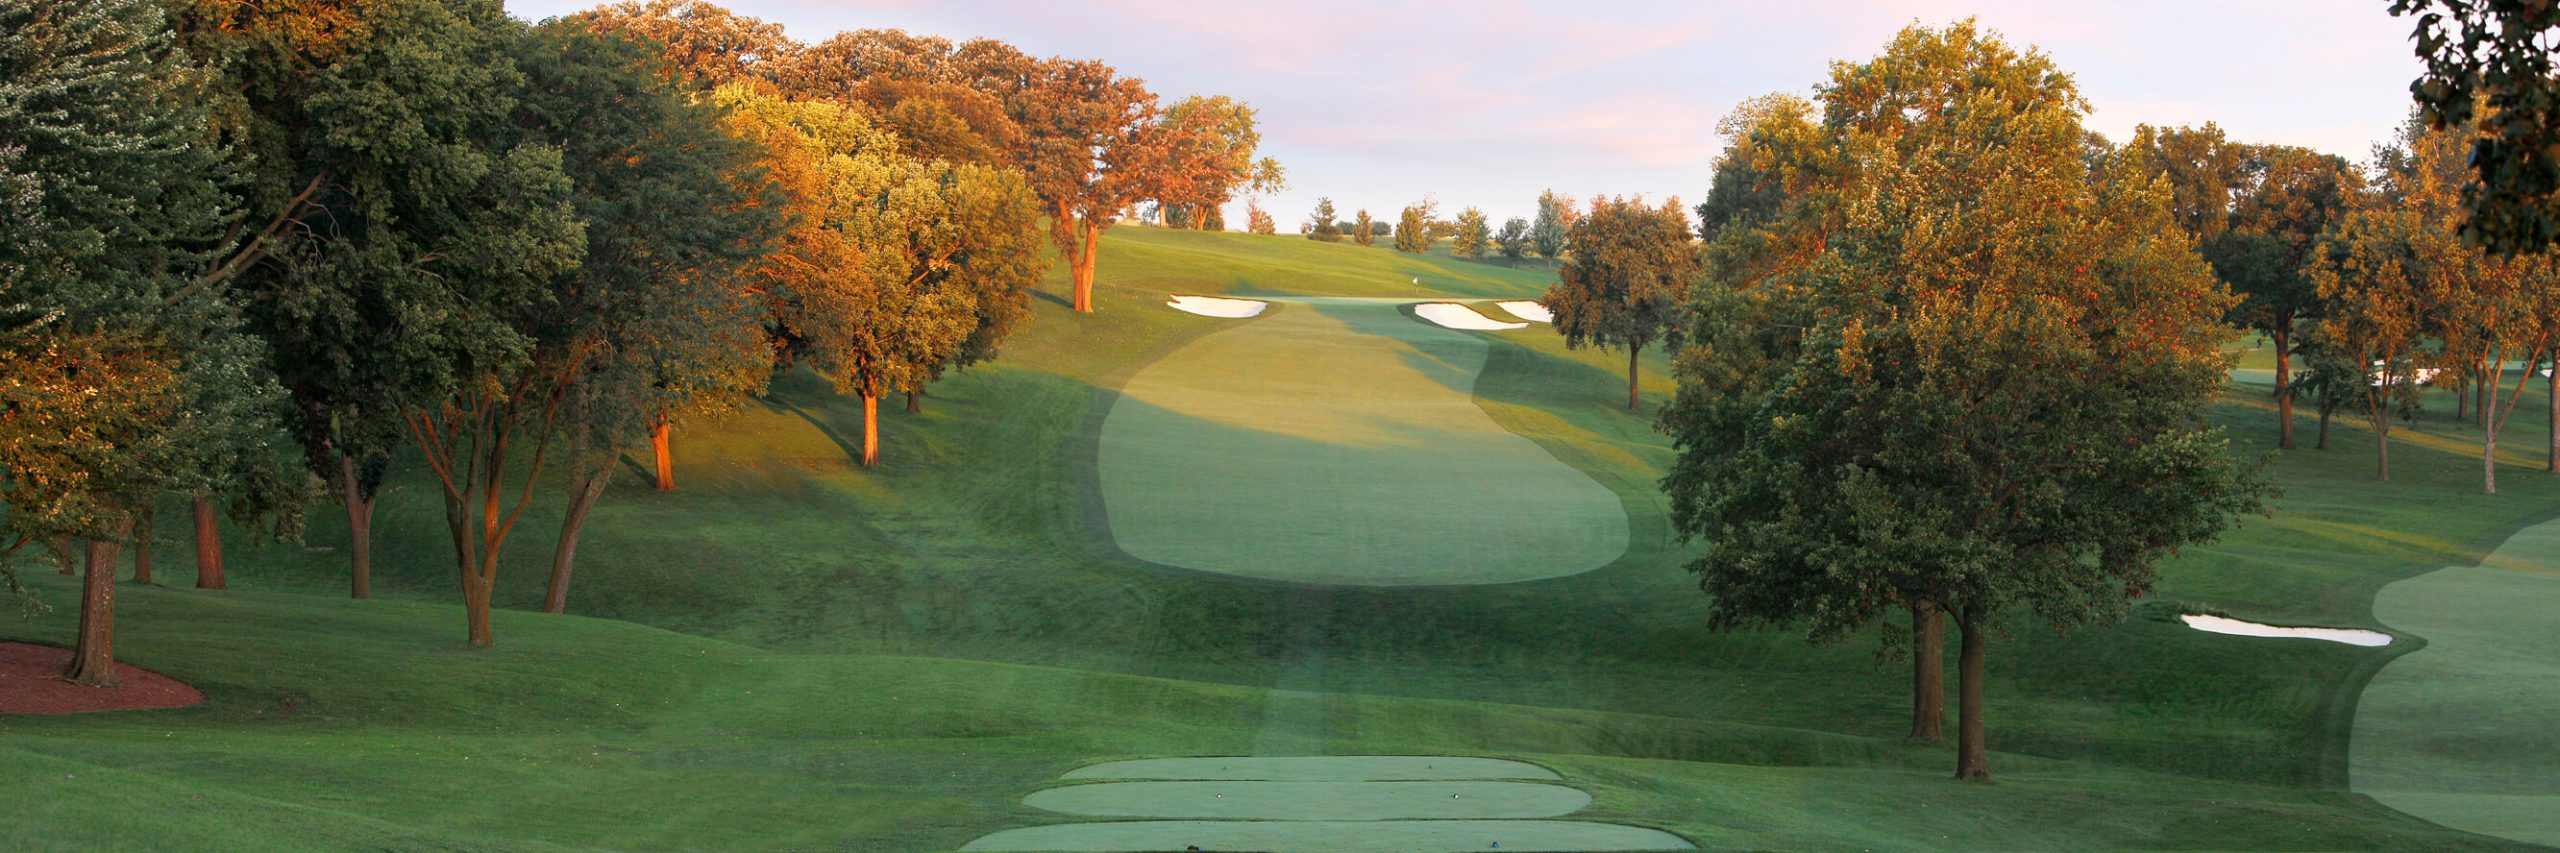 Golf Course Image - Omaha Country Club No. 17